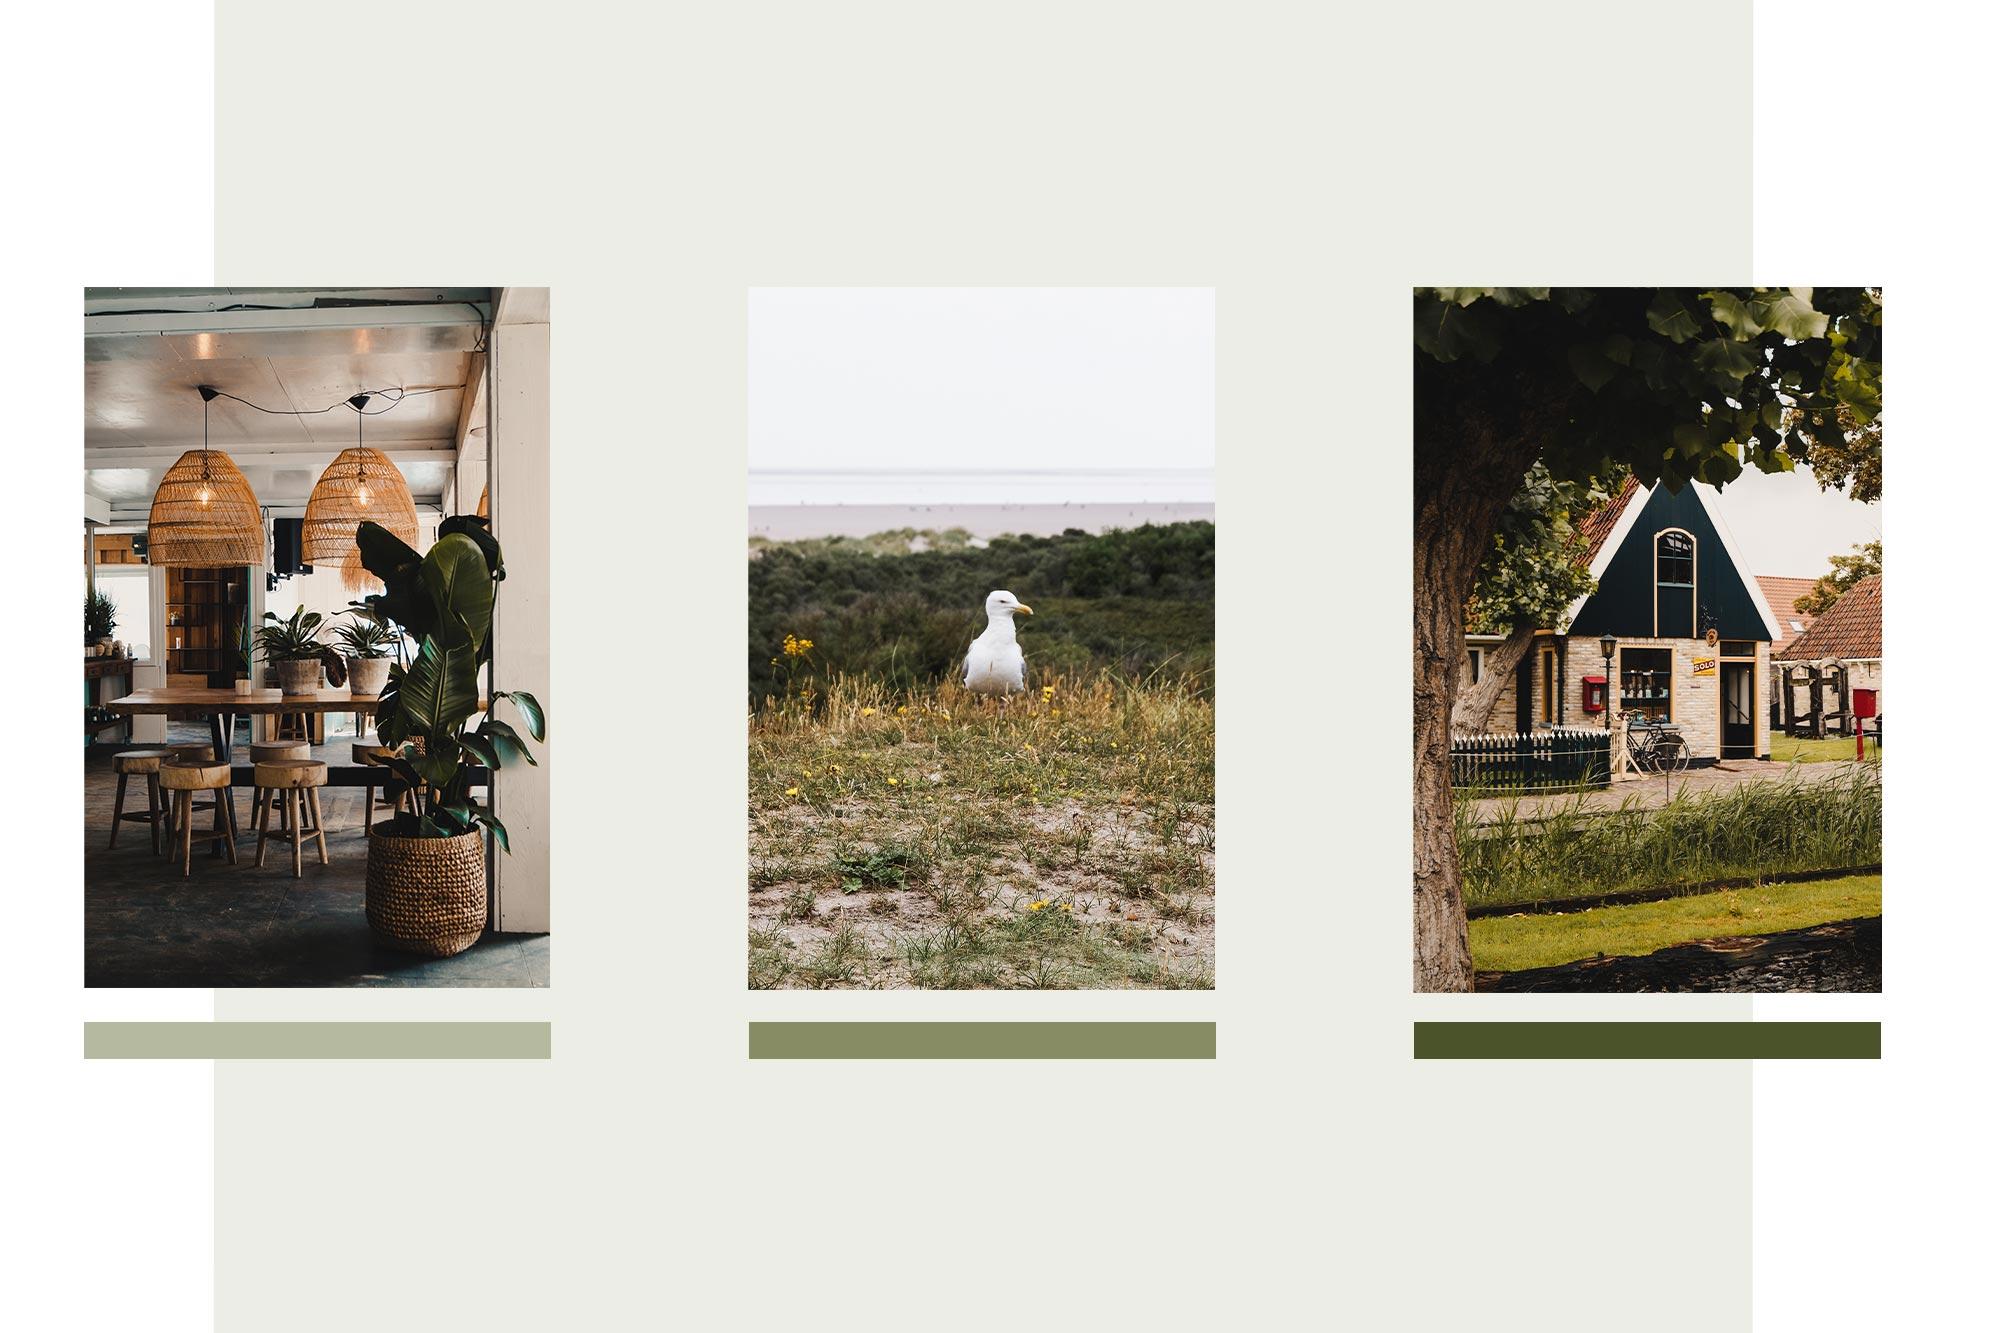 The New Journey - Texel